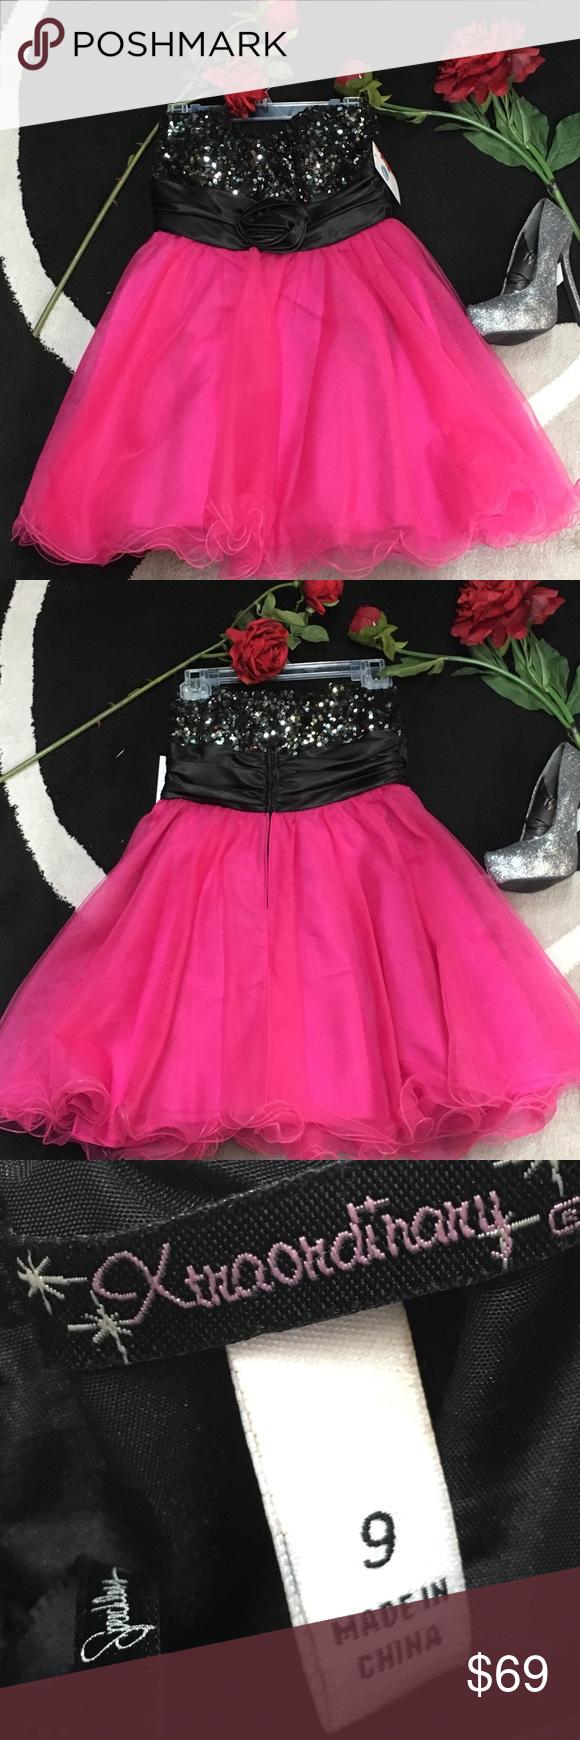 Xtraordinary pinkblack formal dress size pinterest pink black